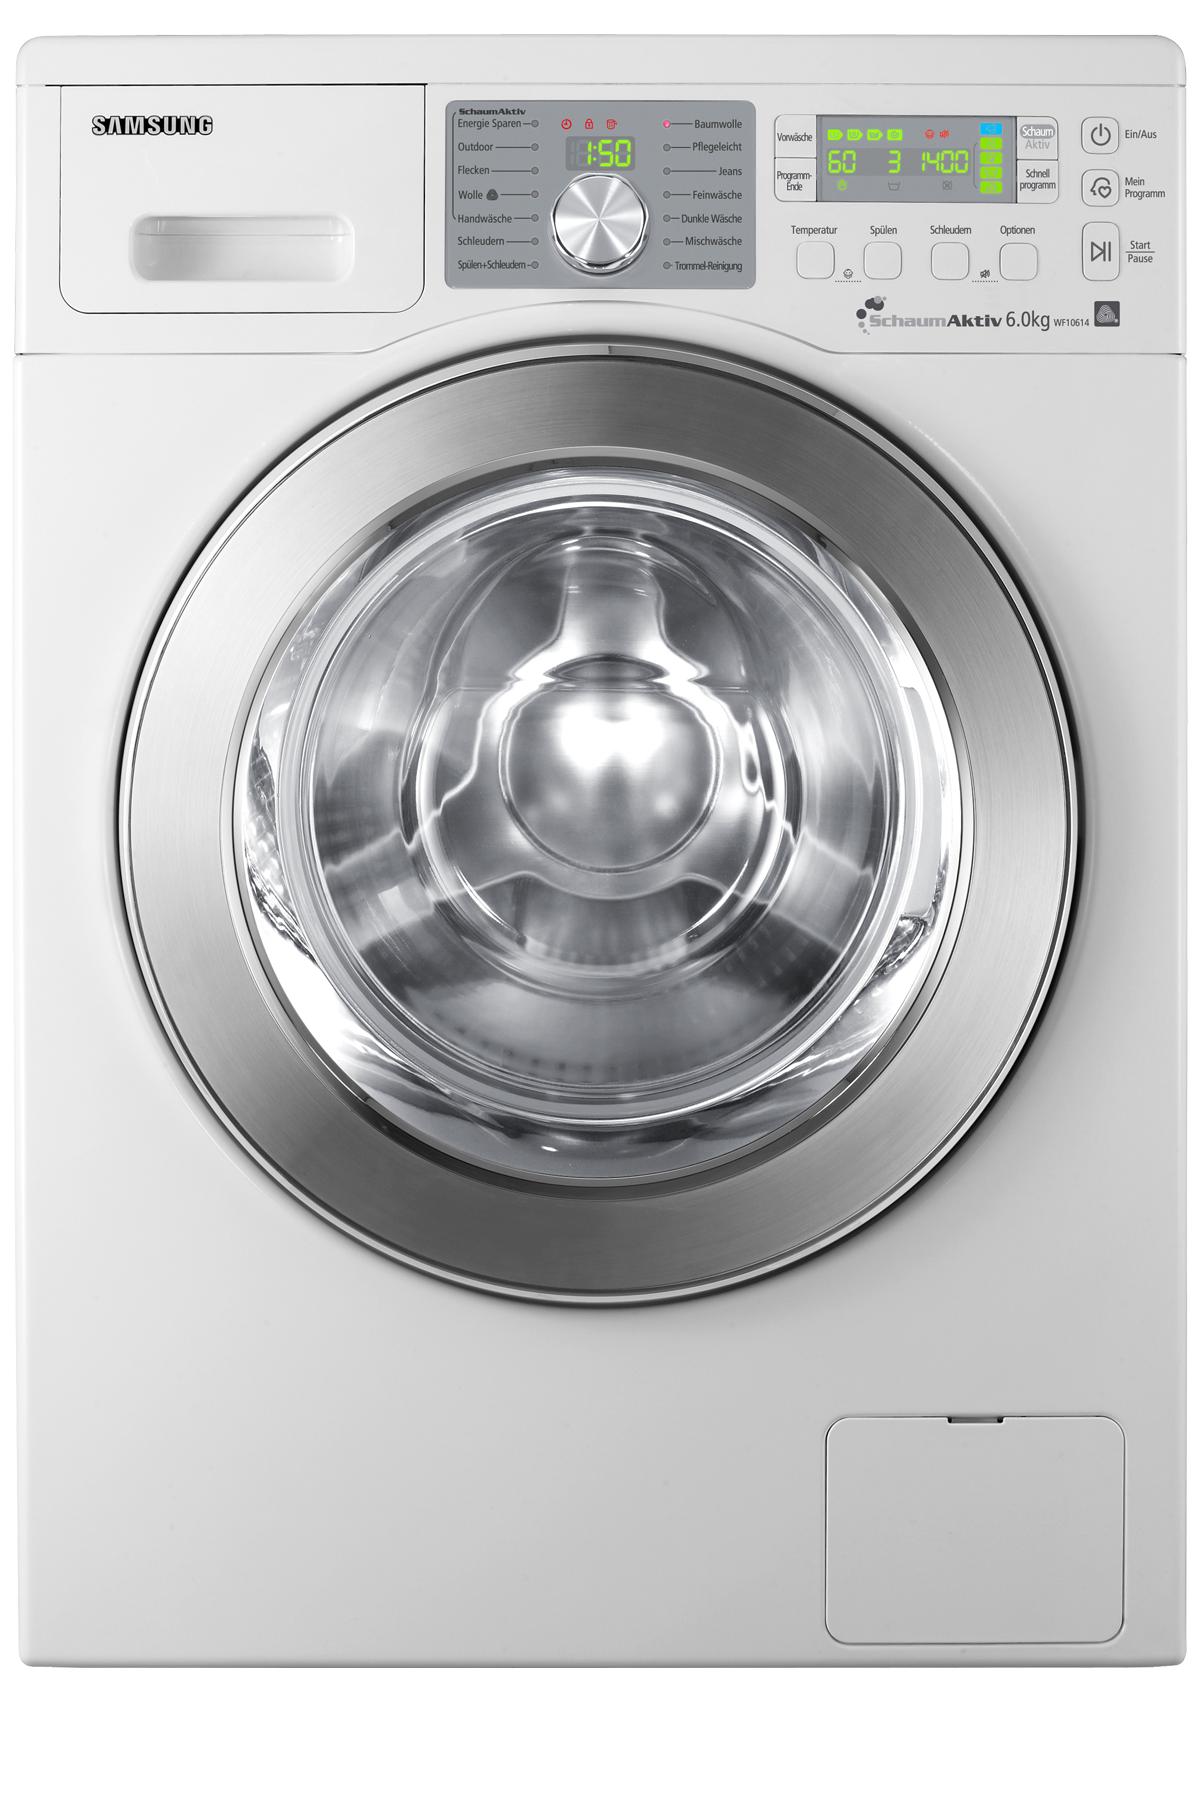 Aegis3 Washer with Eco Bubble, 6 kg, White